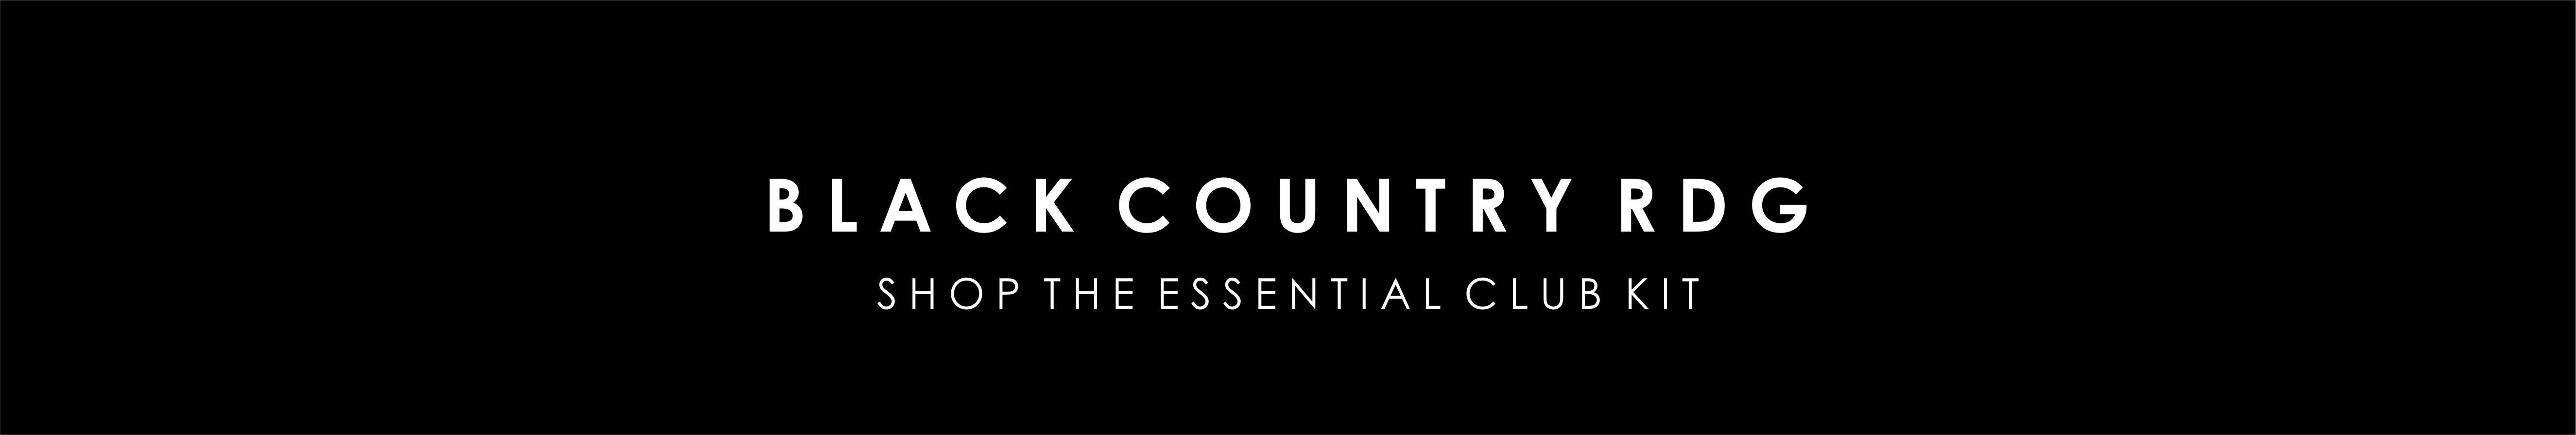 black-country-banner.jpg